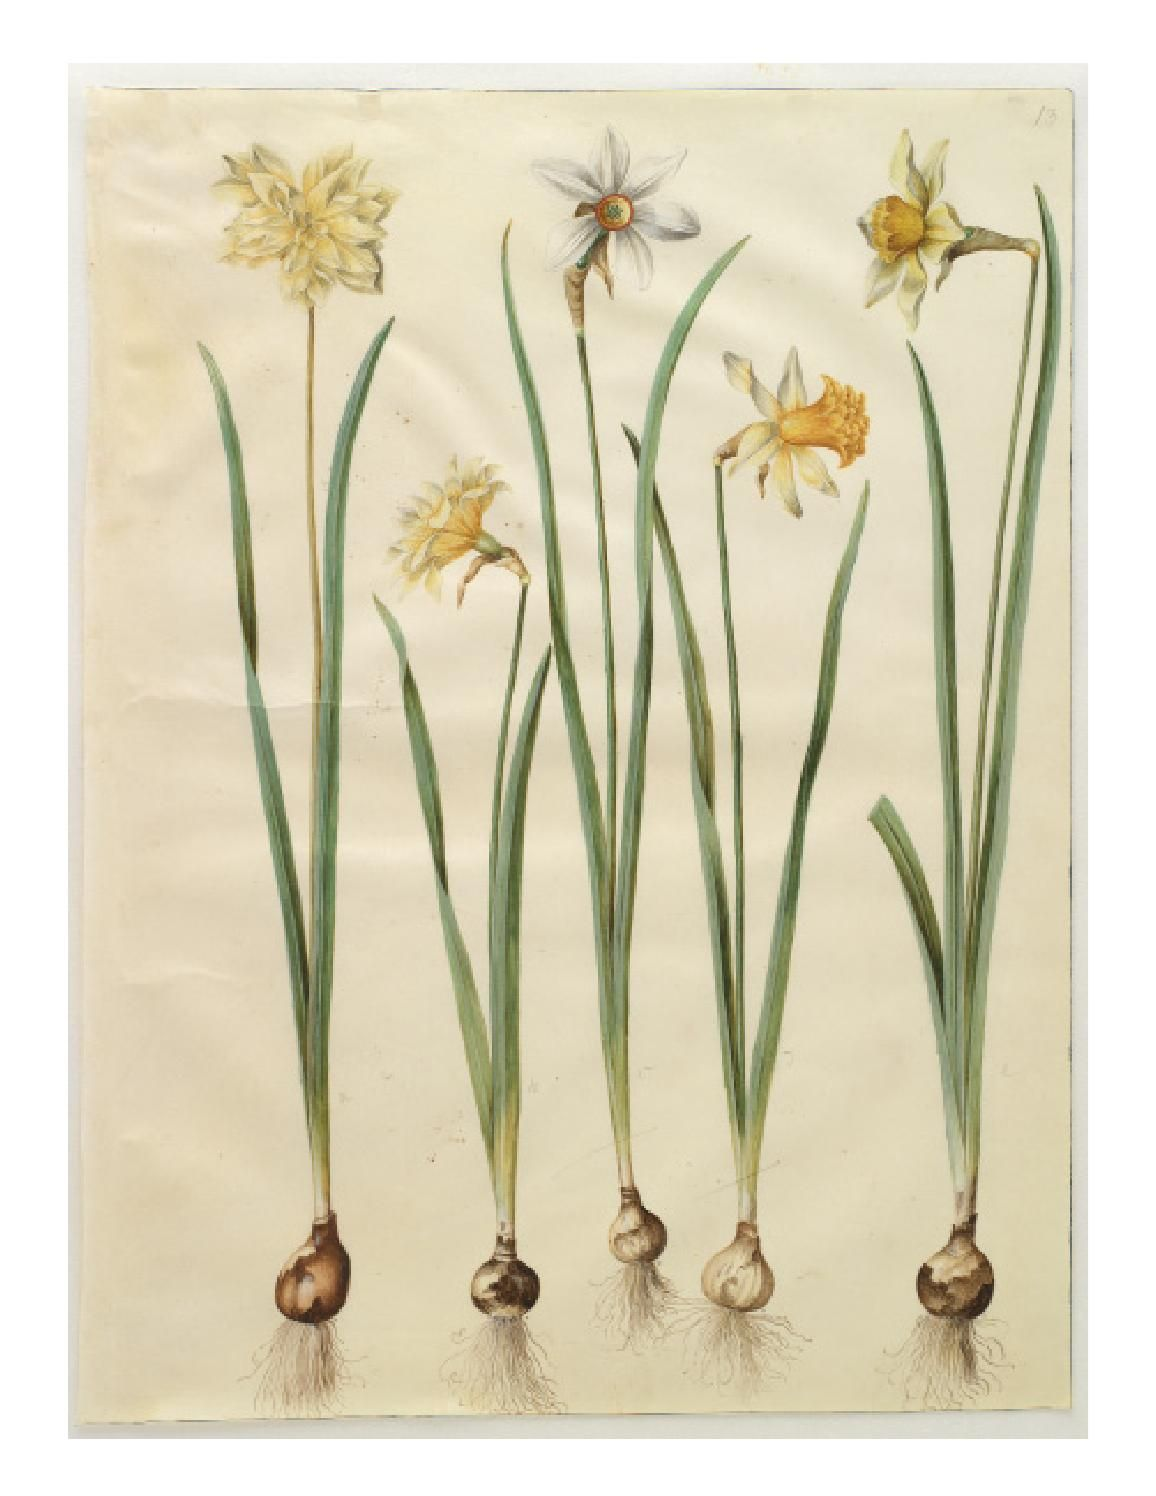 Gottorfer Codex Botanical drawings, Botanical